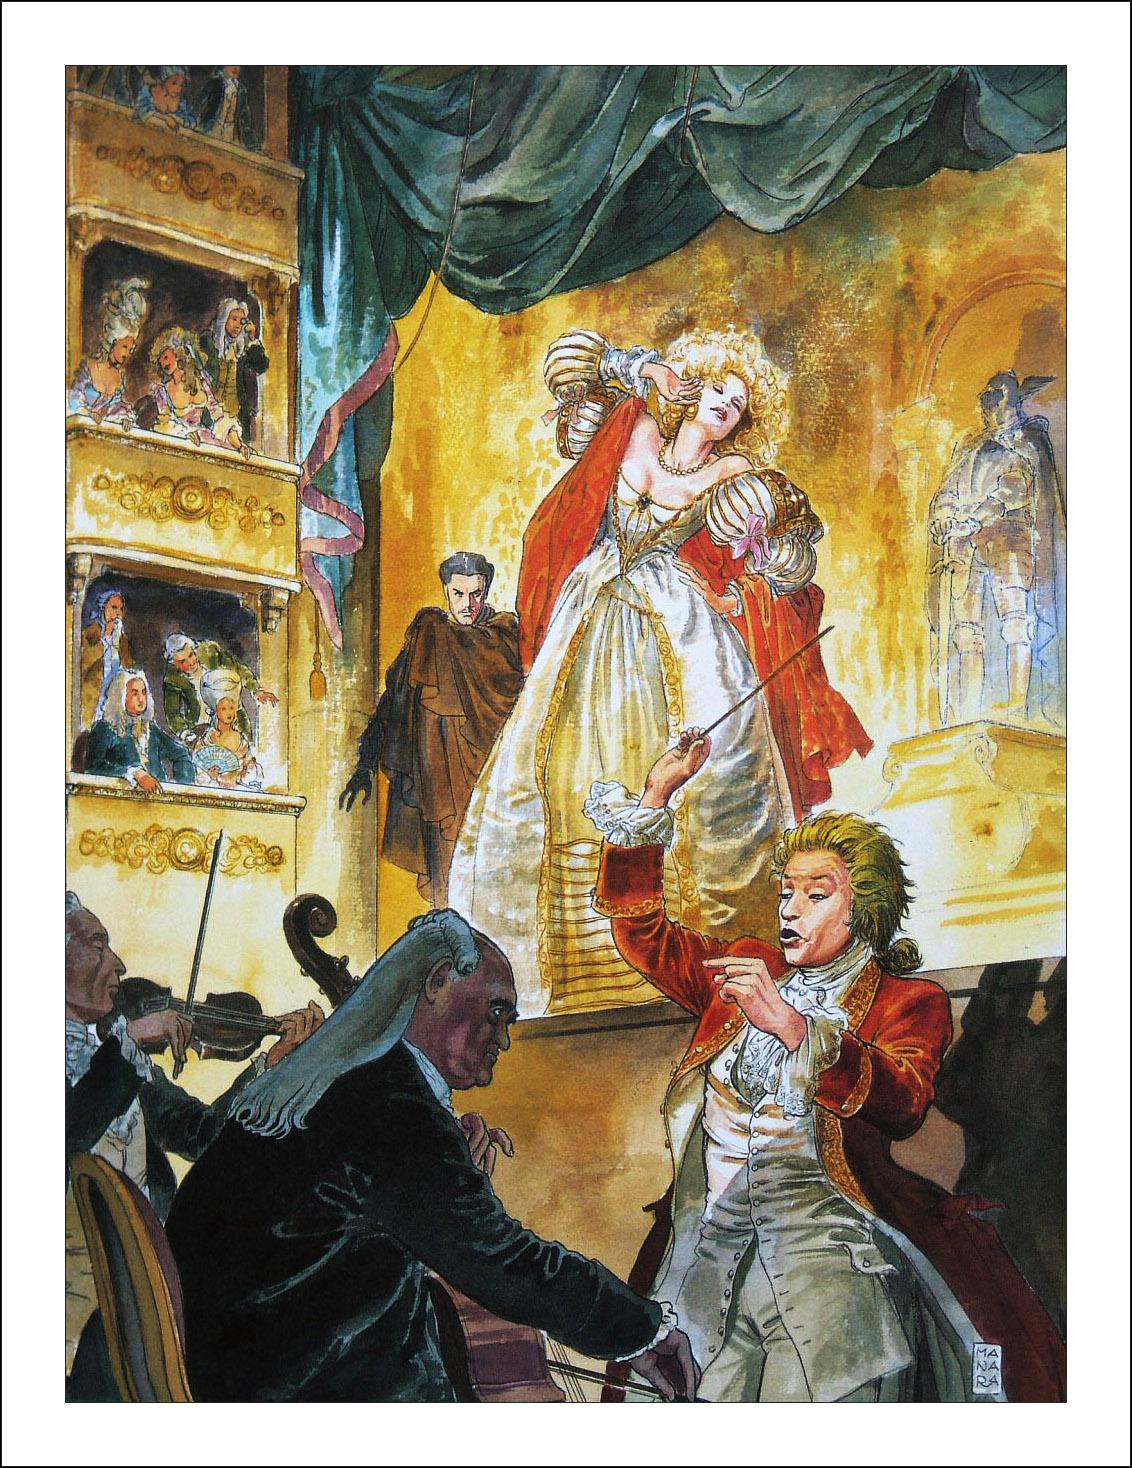 Milo Manara, Pentiti! Mozart 250